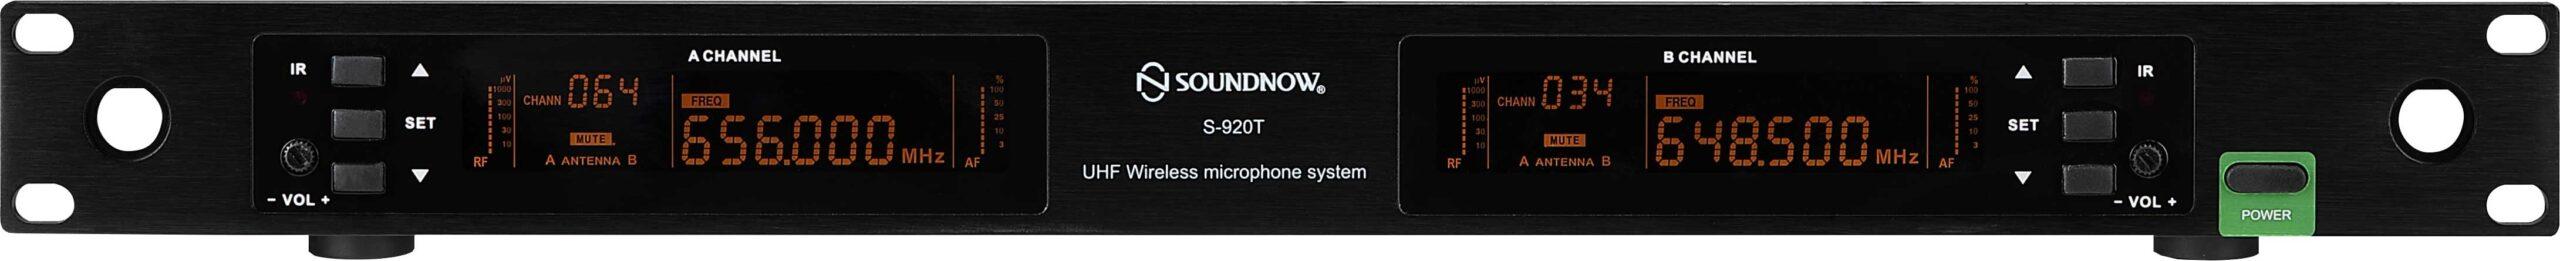 mặt trước Micro cao cấp soundnow